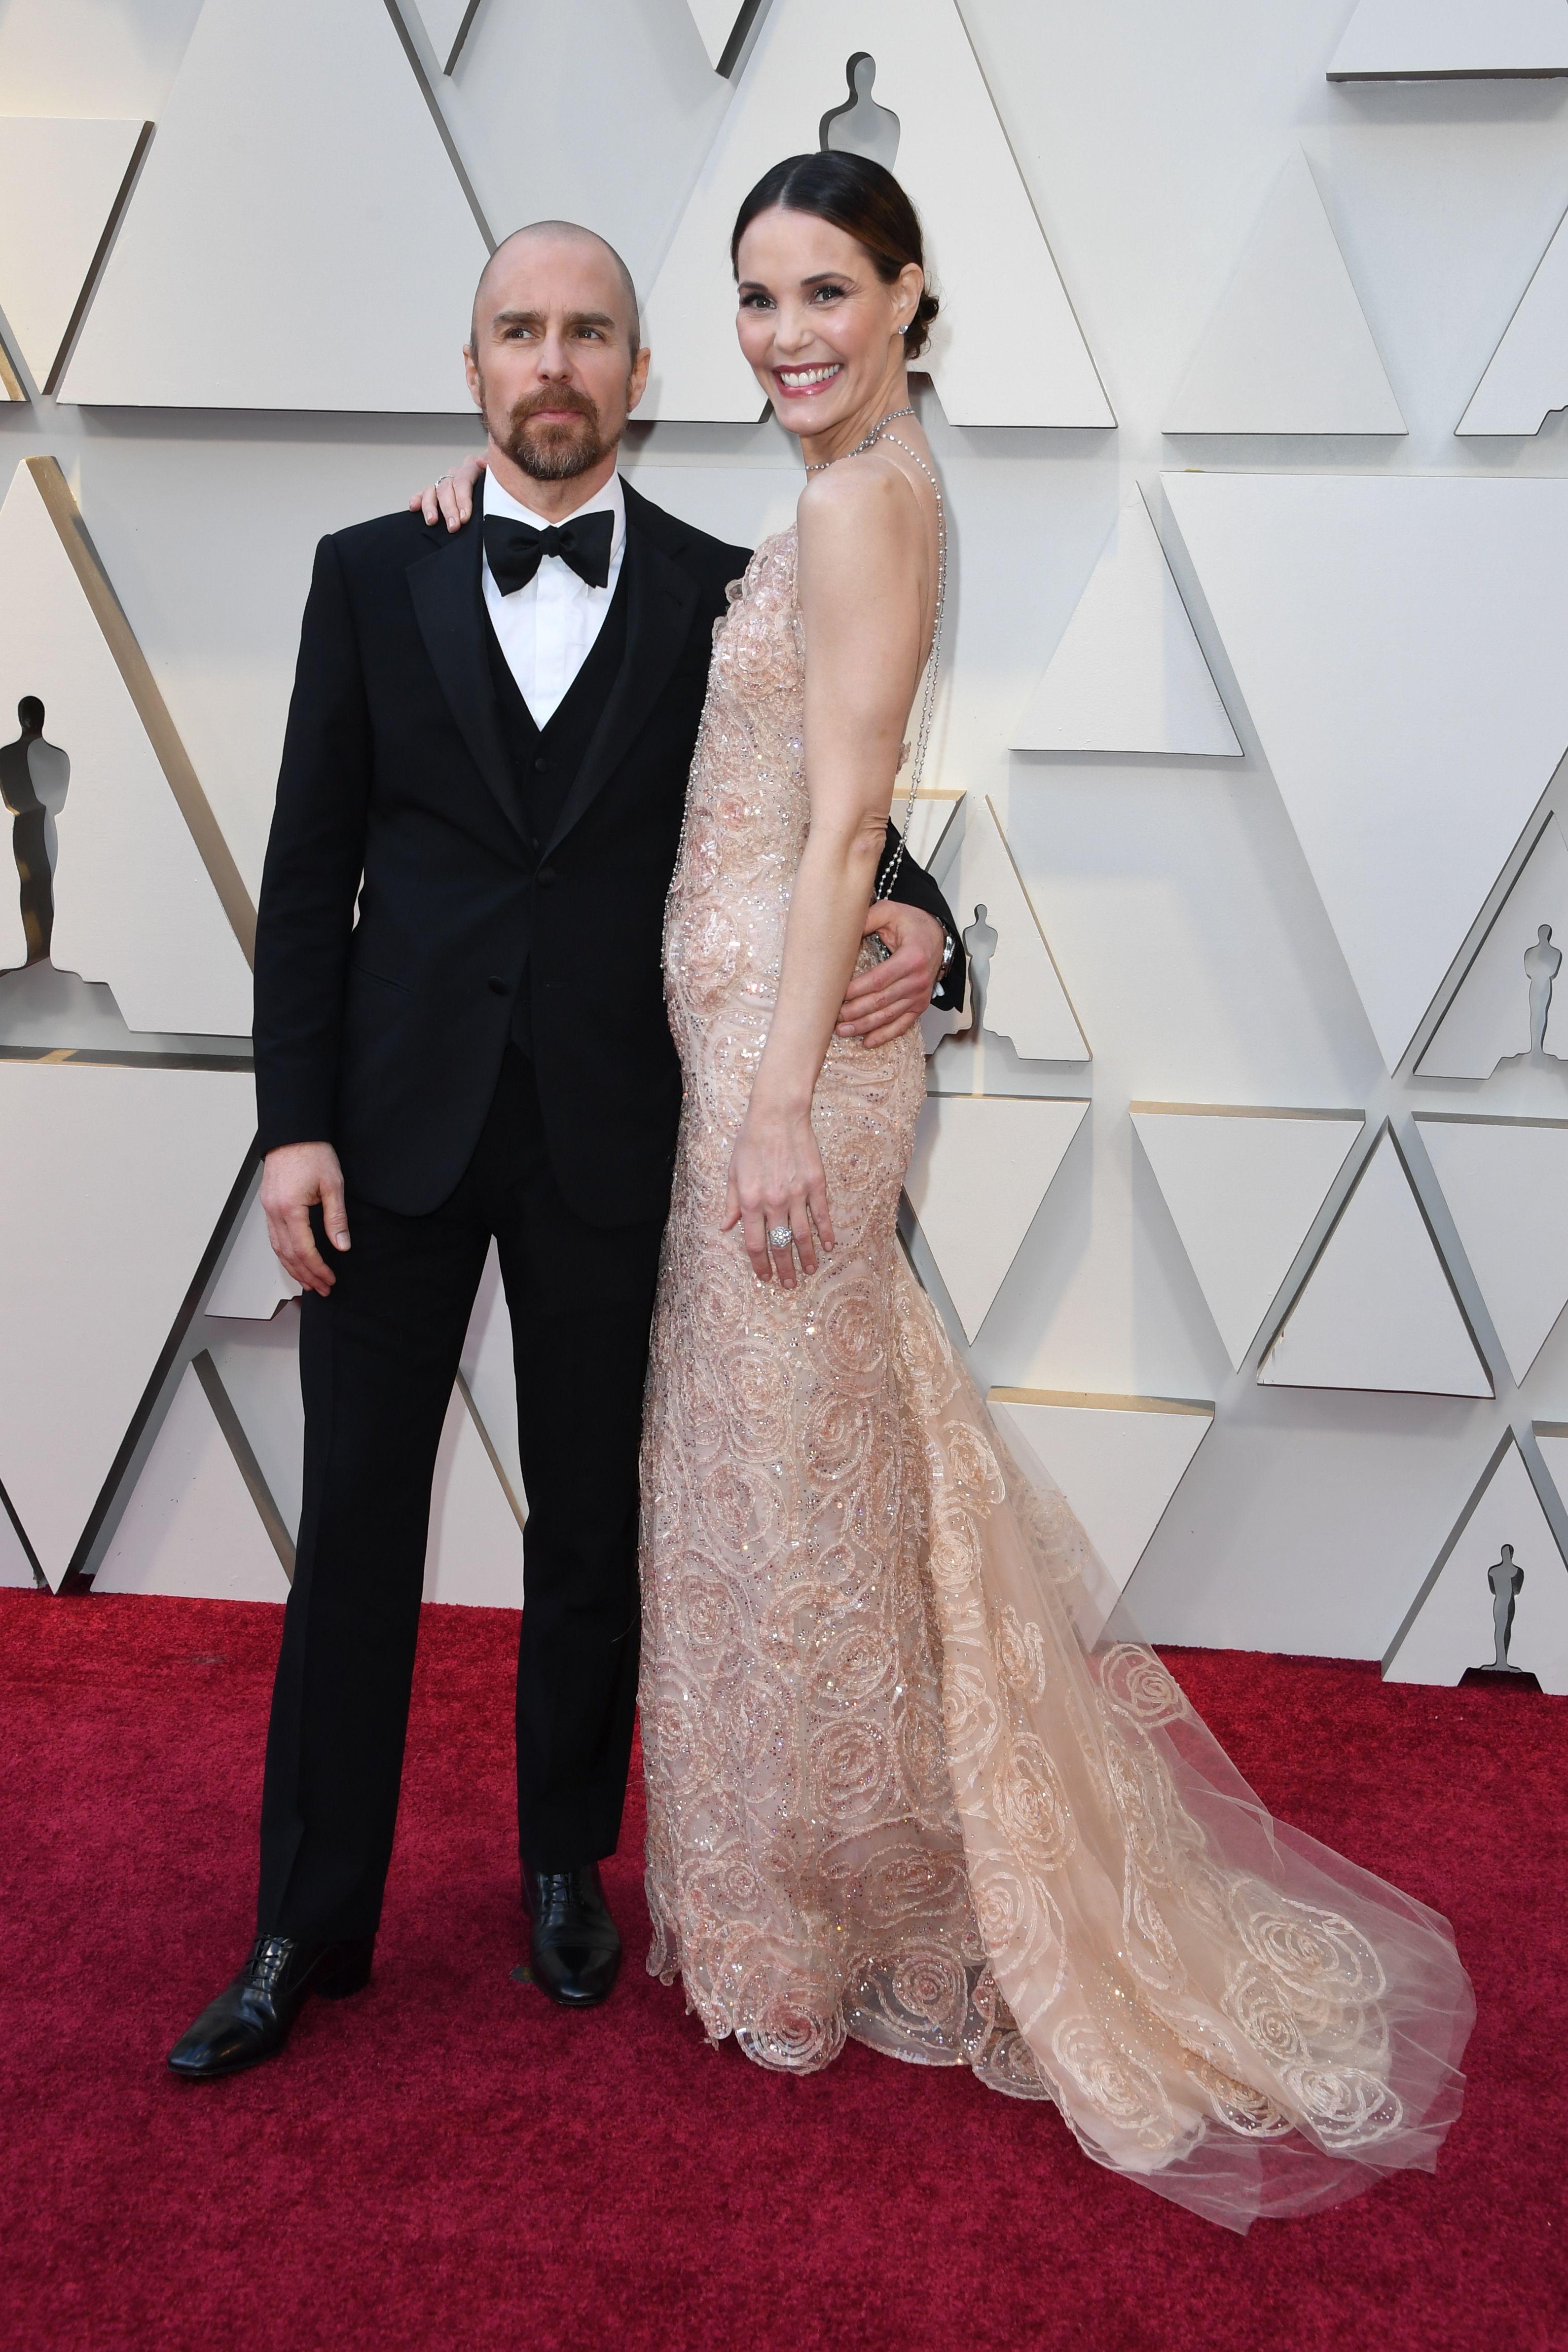 De Vestidos 2019 Oscar 2019Looks La Roja Premios Alfombra J3TFK1lc